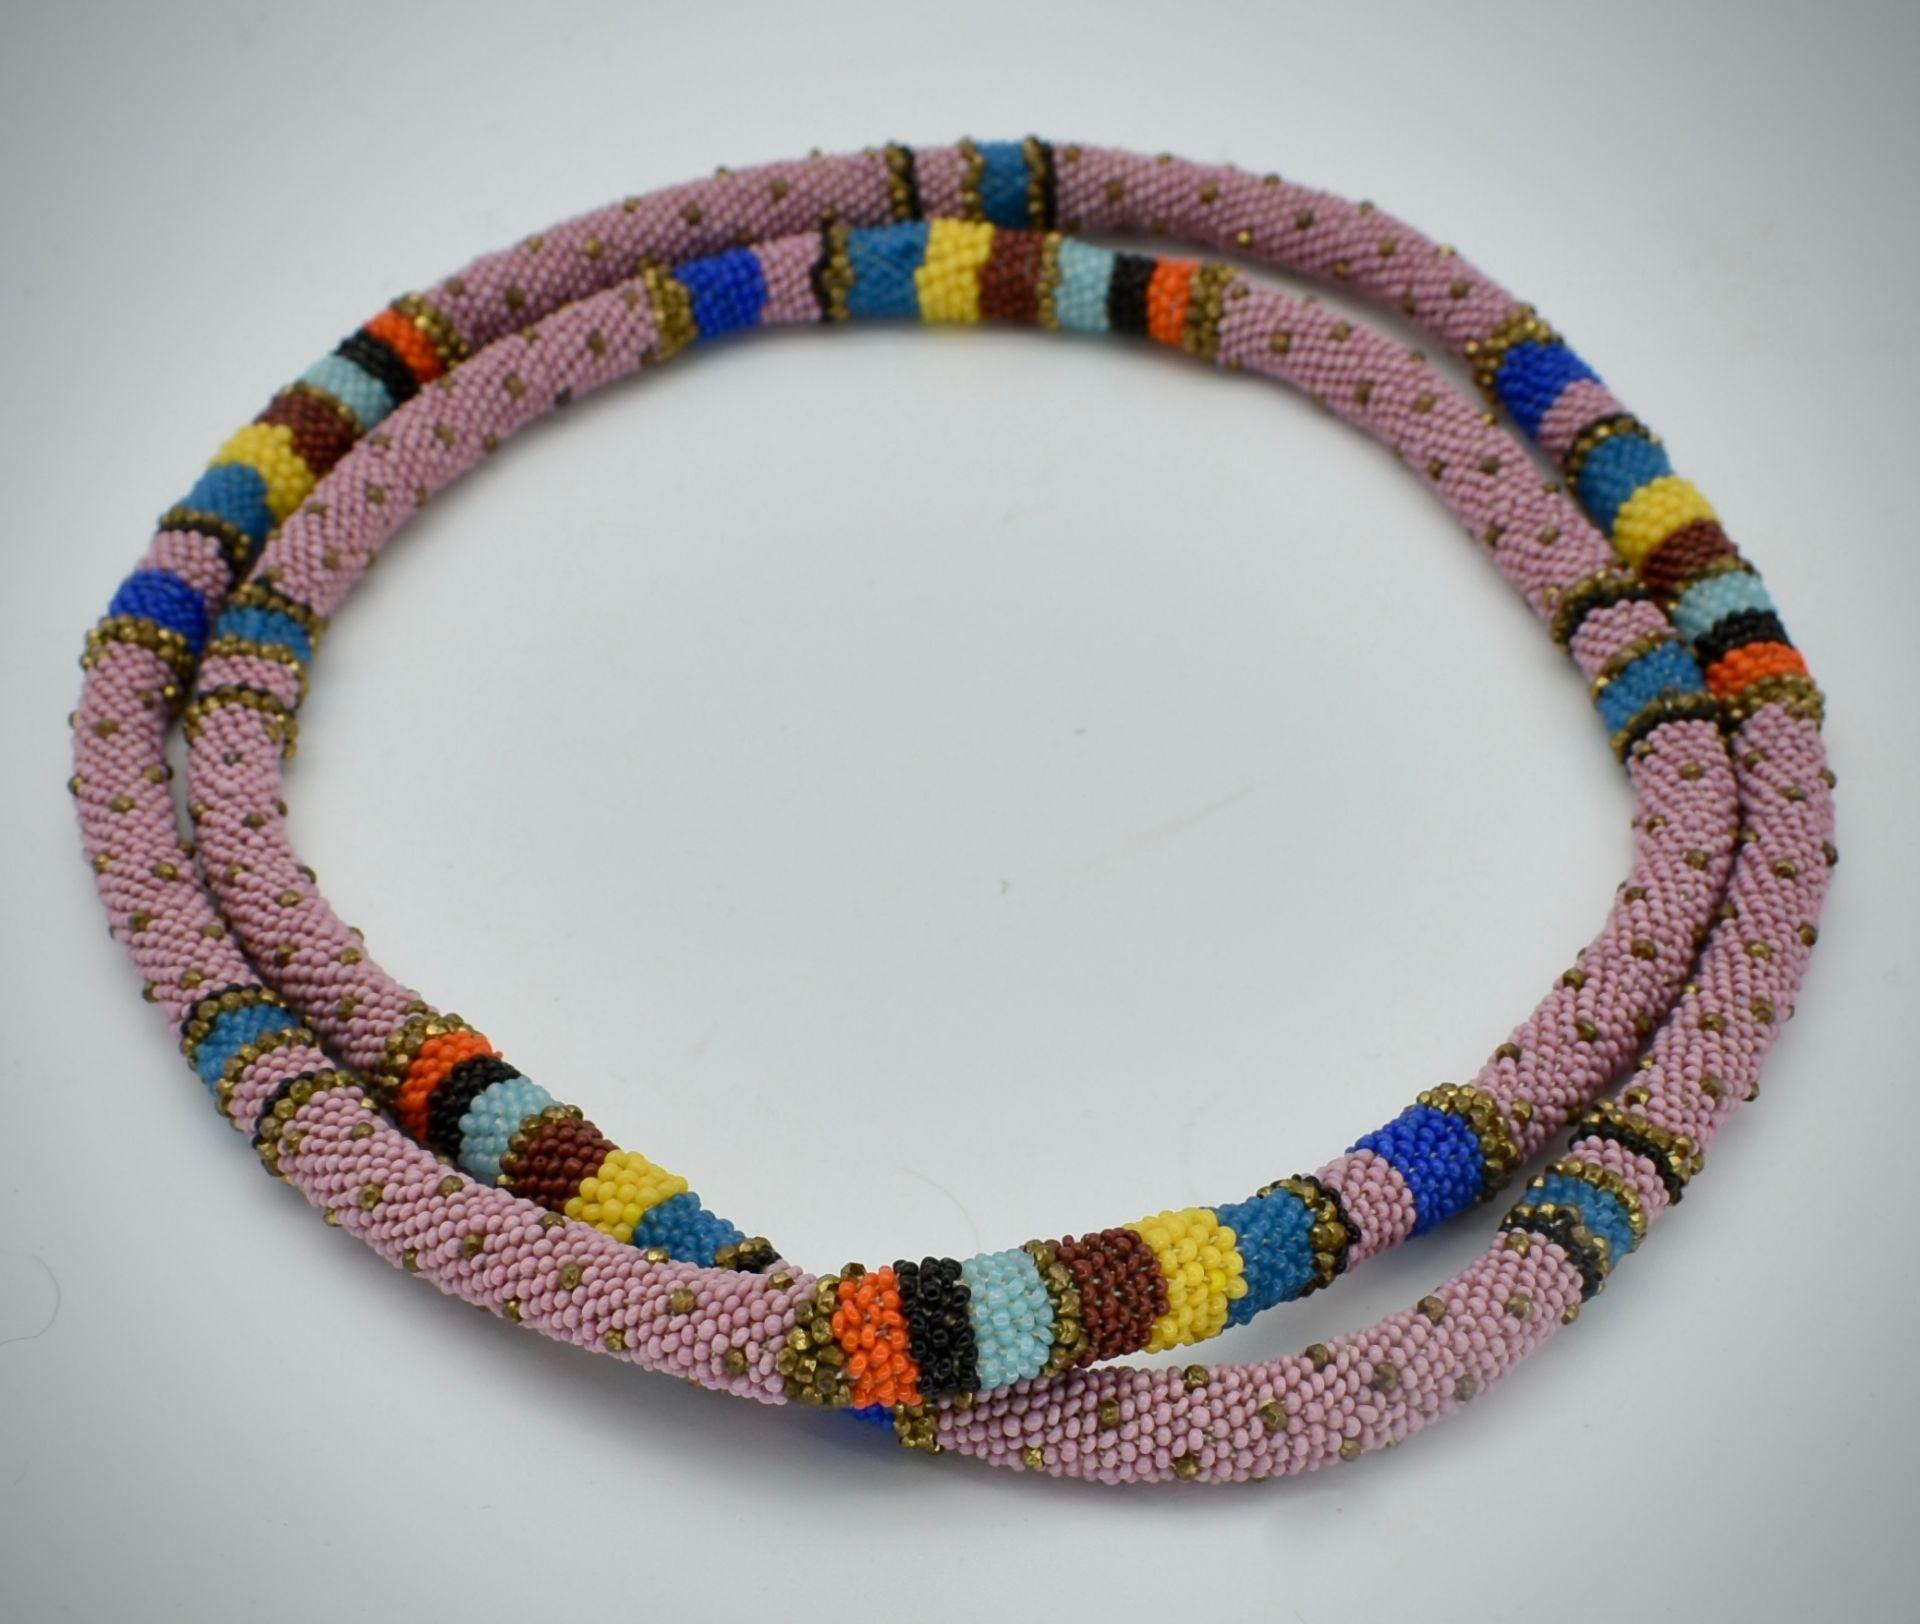 Wiener Werkstätte Micro-Beaded Necklace - Image 2 of 3